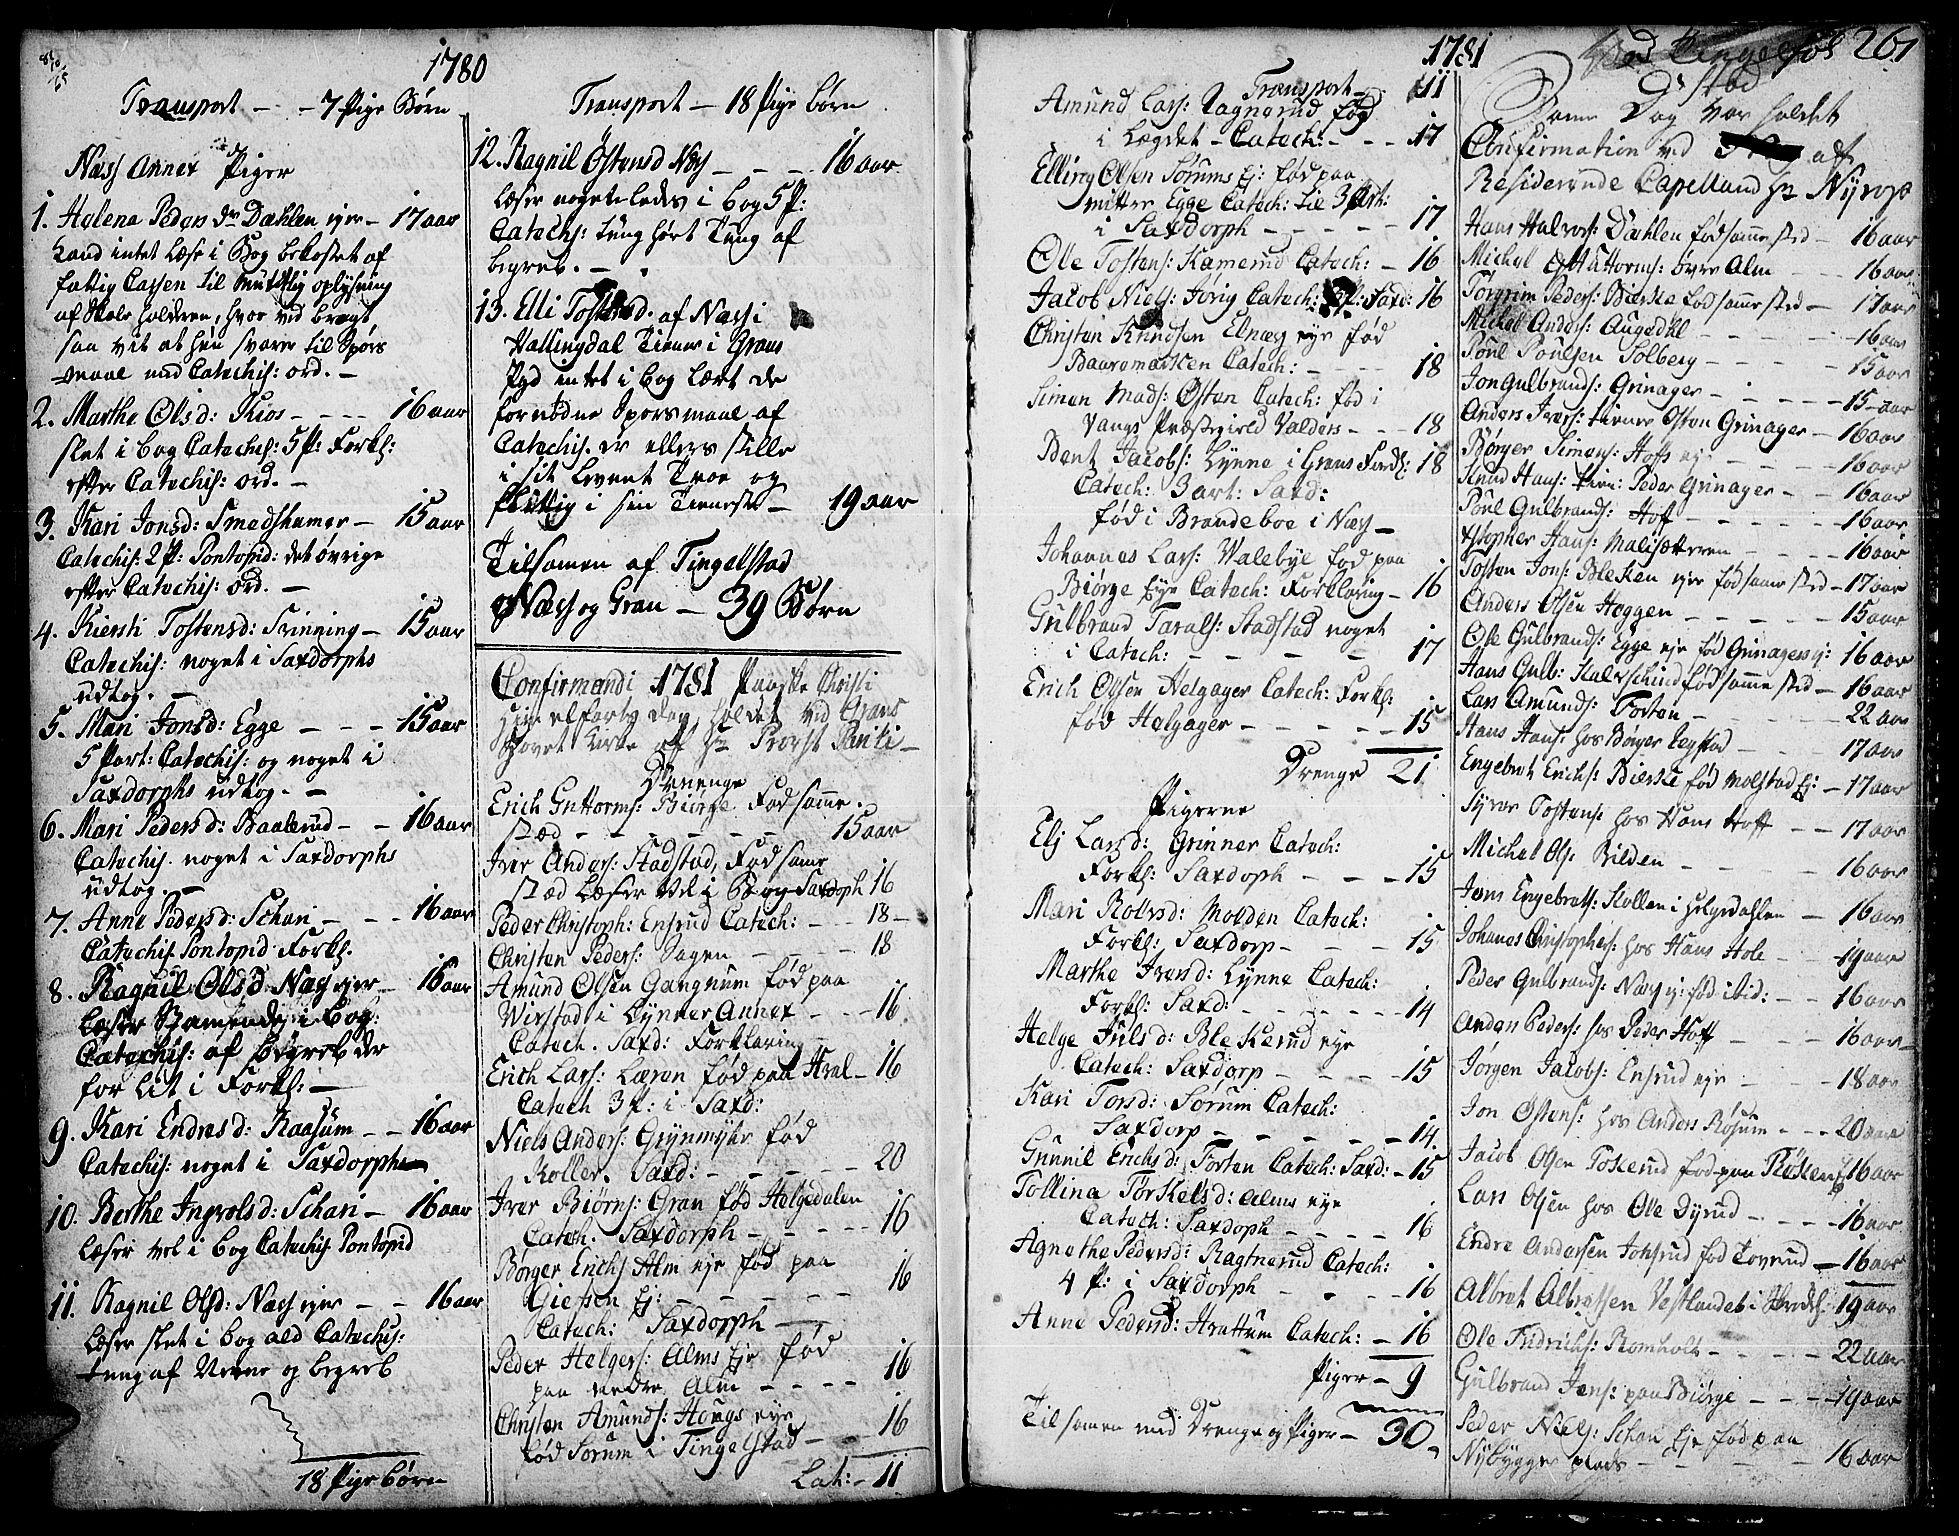 SAH, Gran prestekontor, Ministerialbok nr. 5, 1776-1788, s. 261